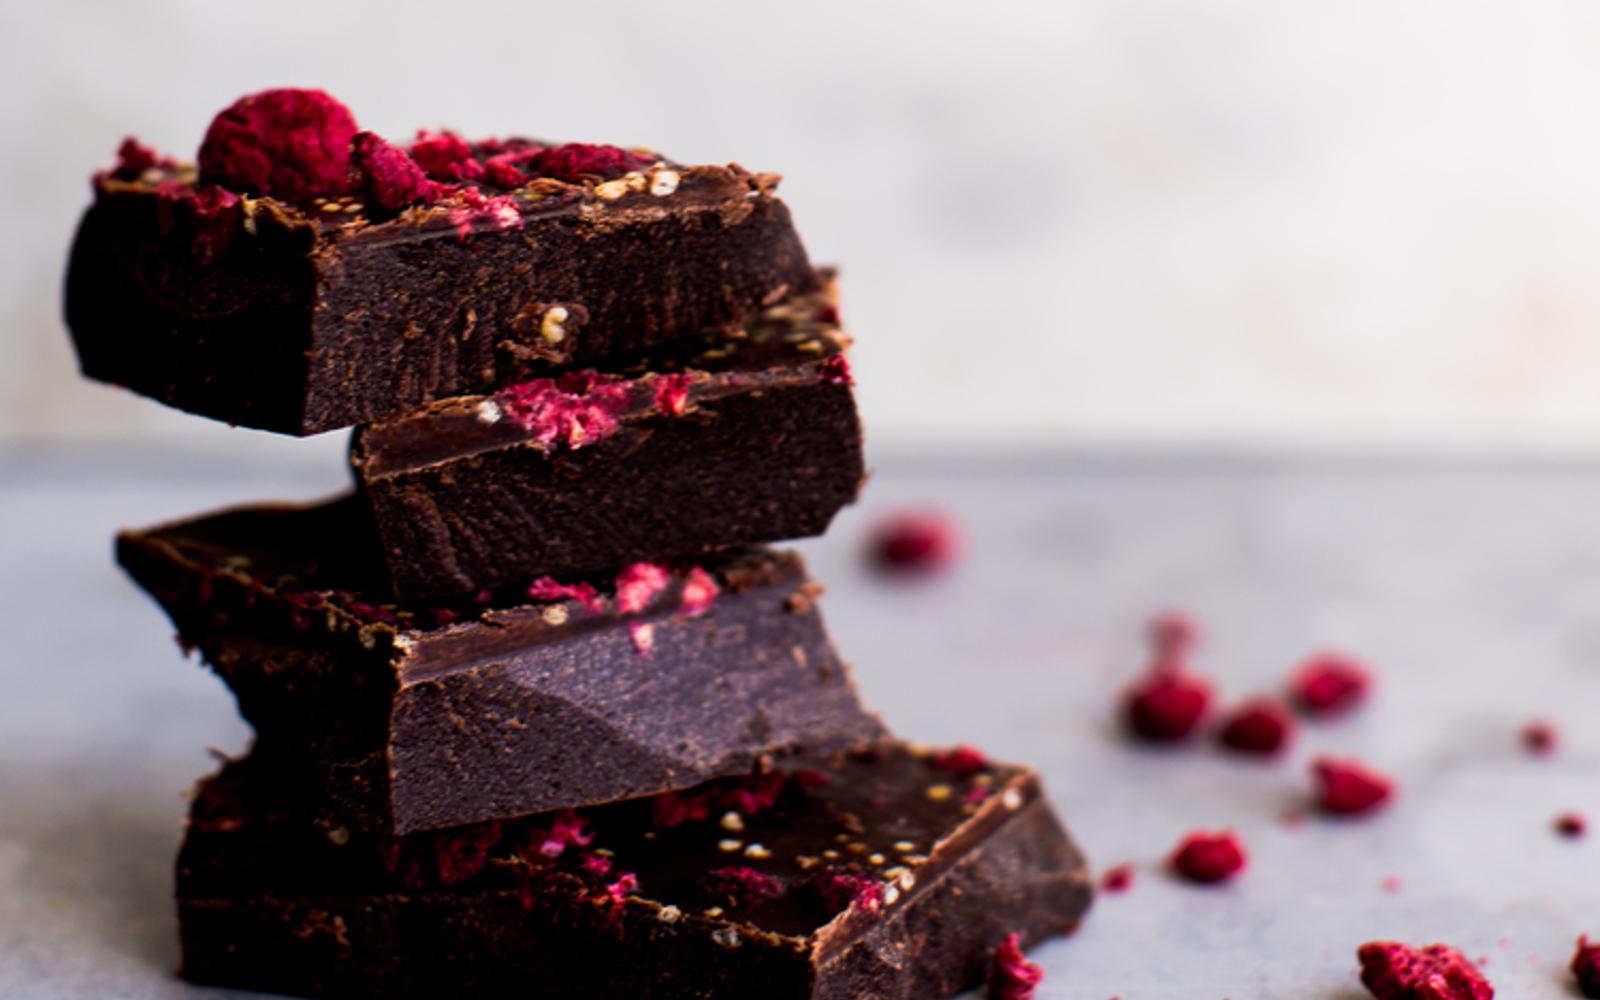 Galaxy Dark Chocolate With Raspberries